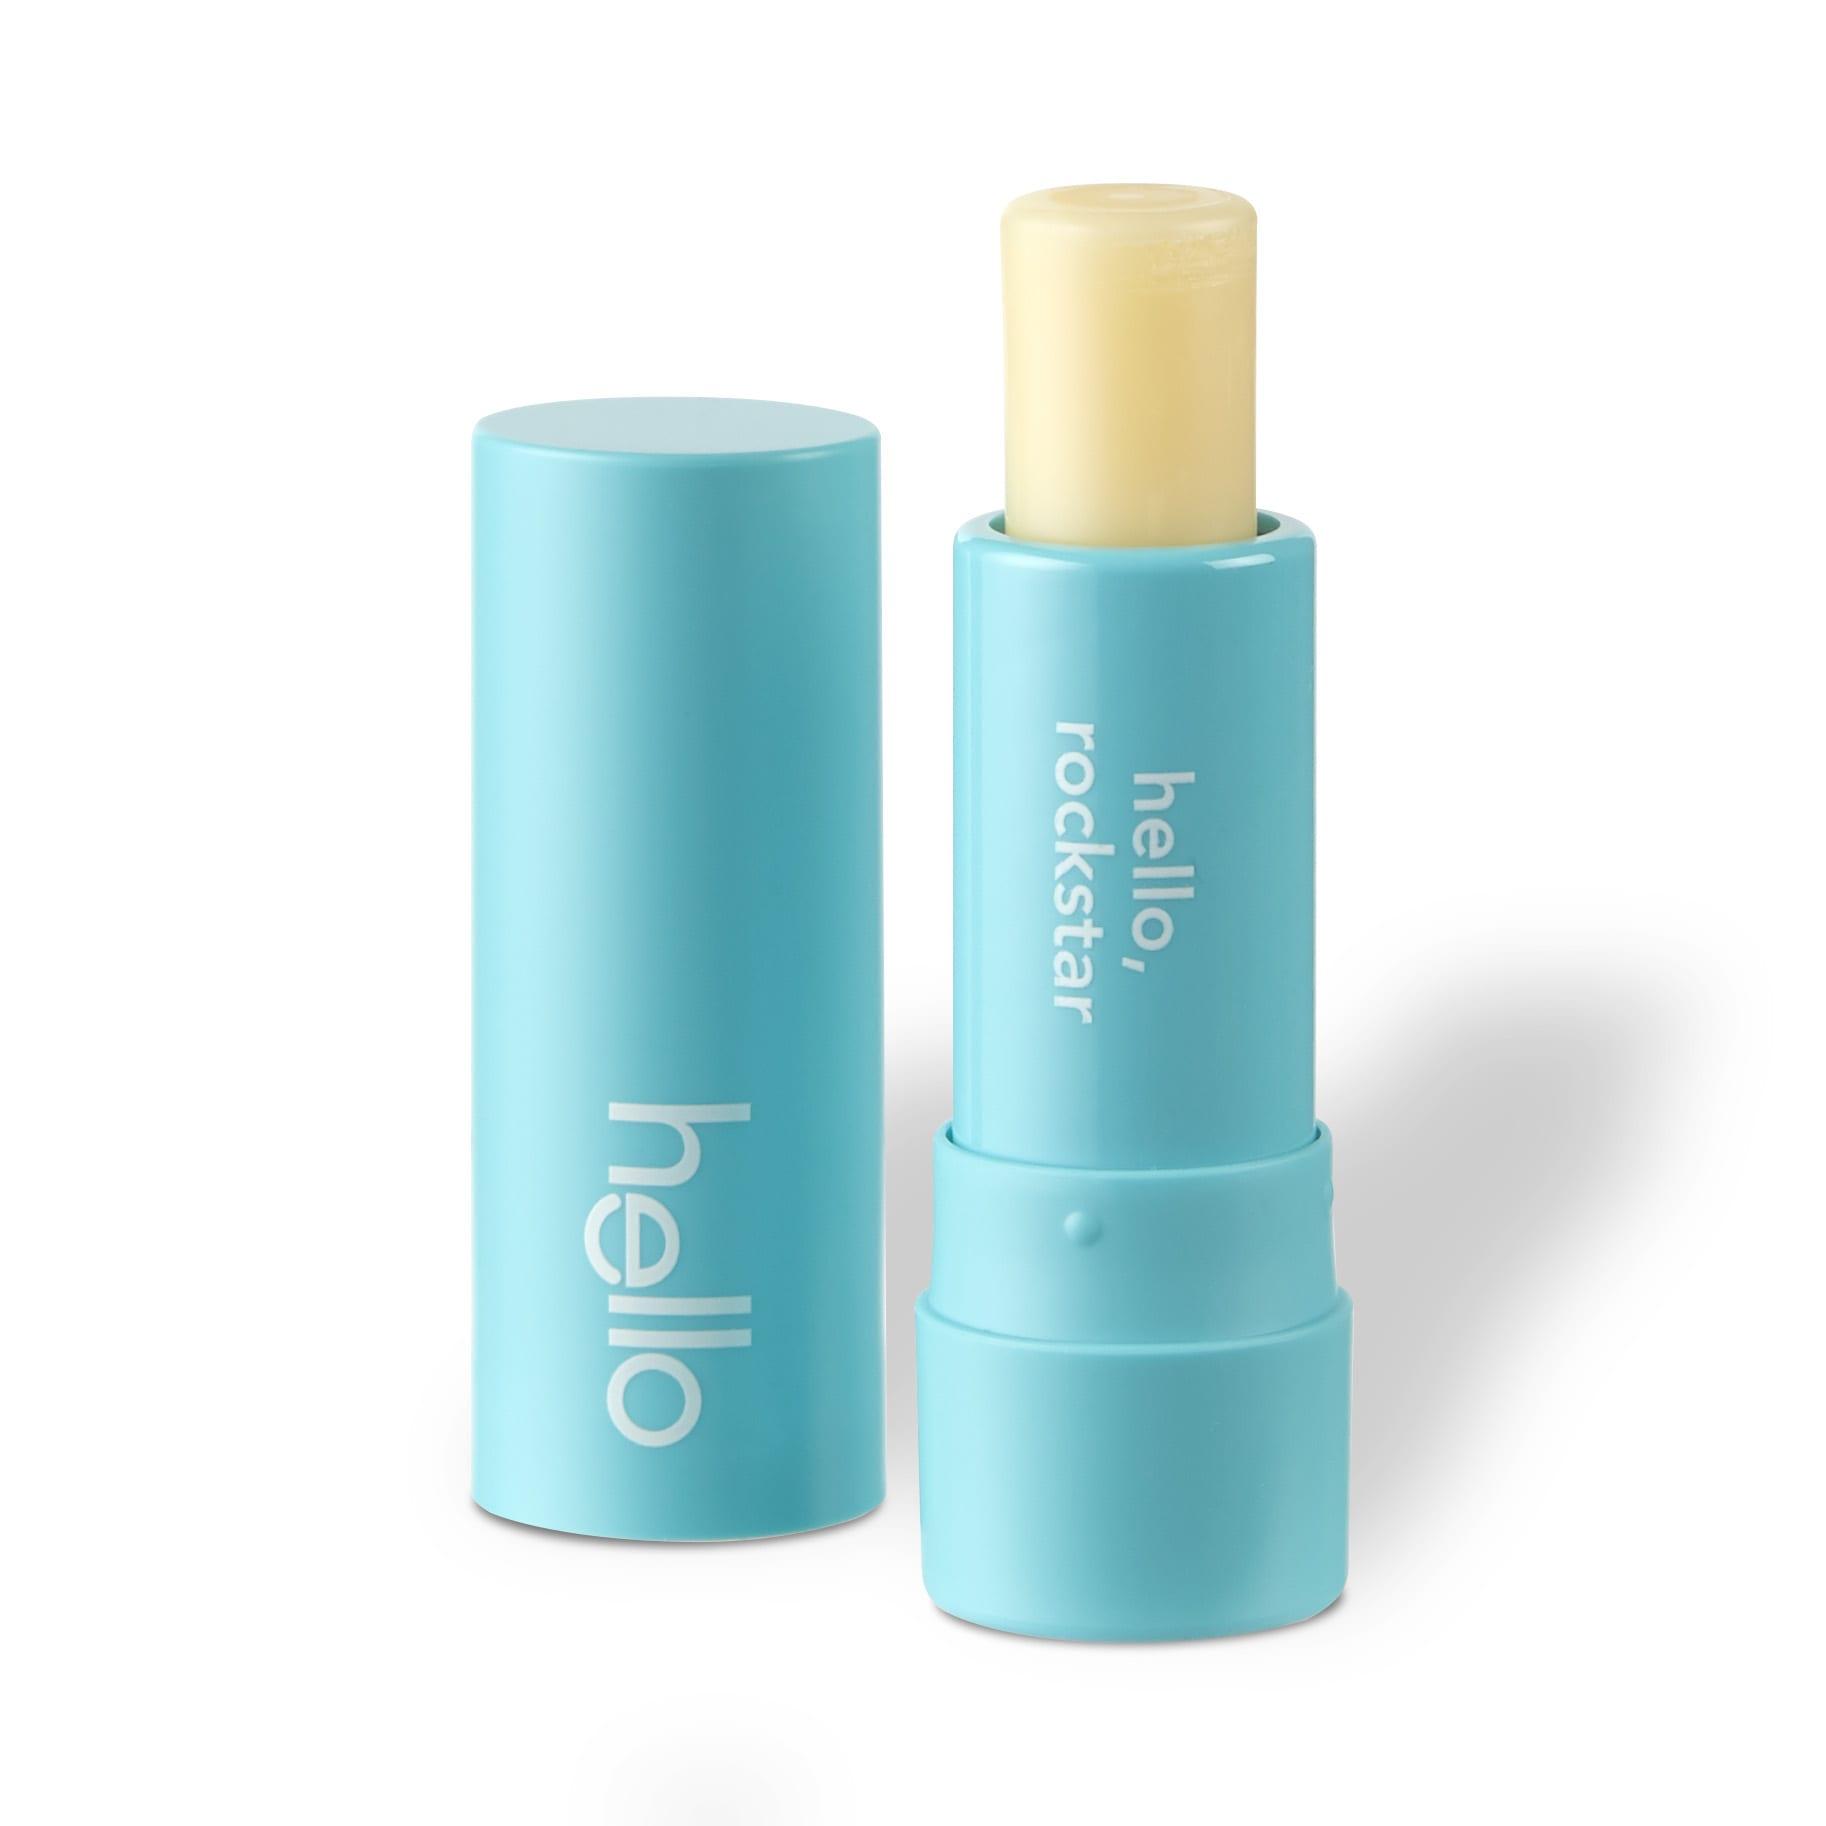 hello® naturally friendly™ sweet mint vegan lip balm